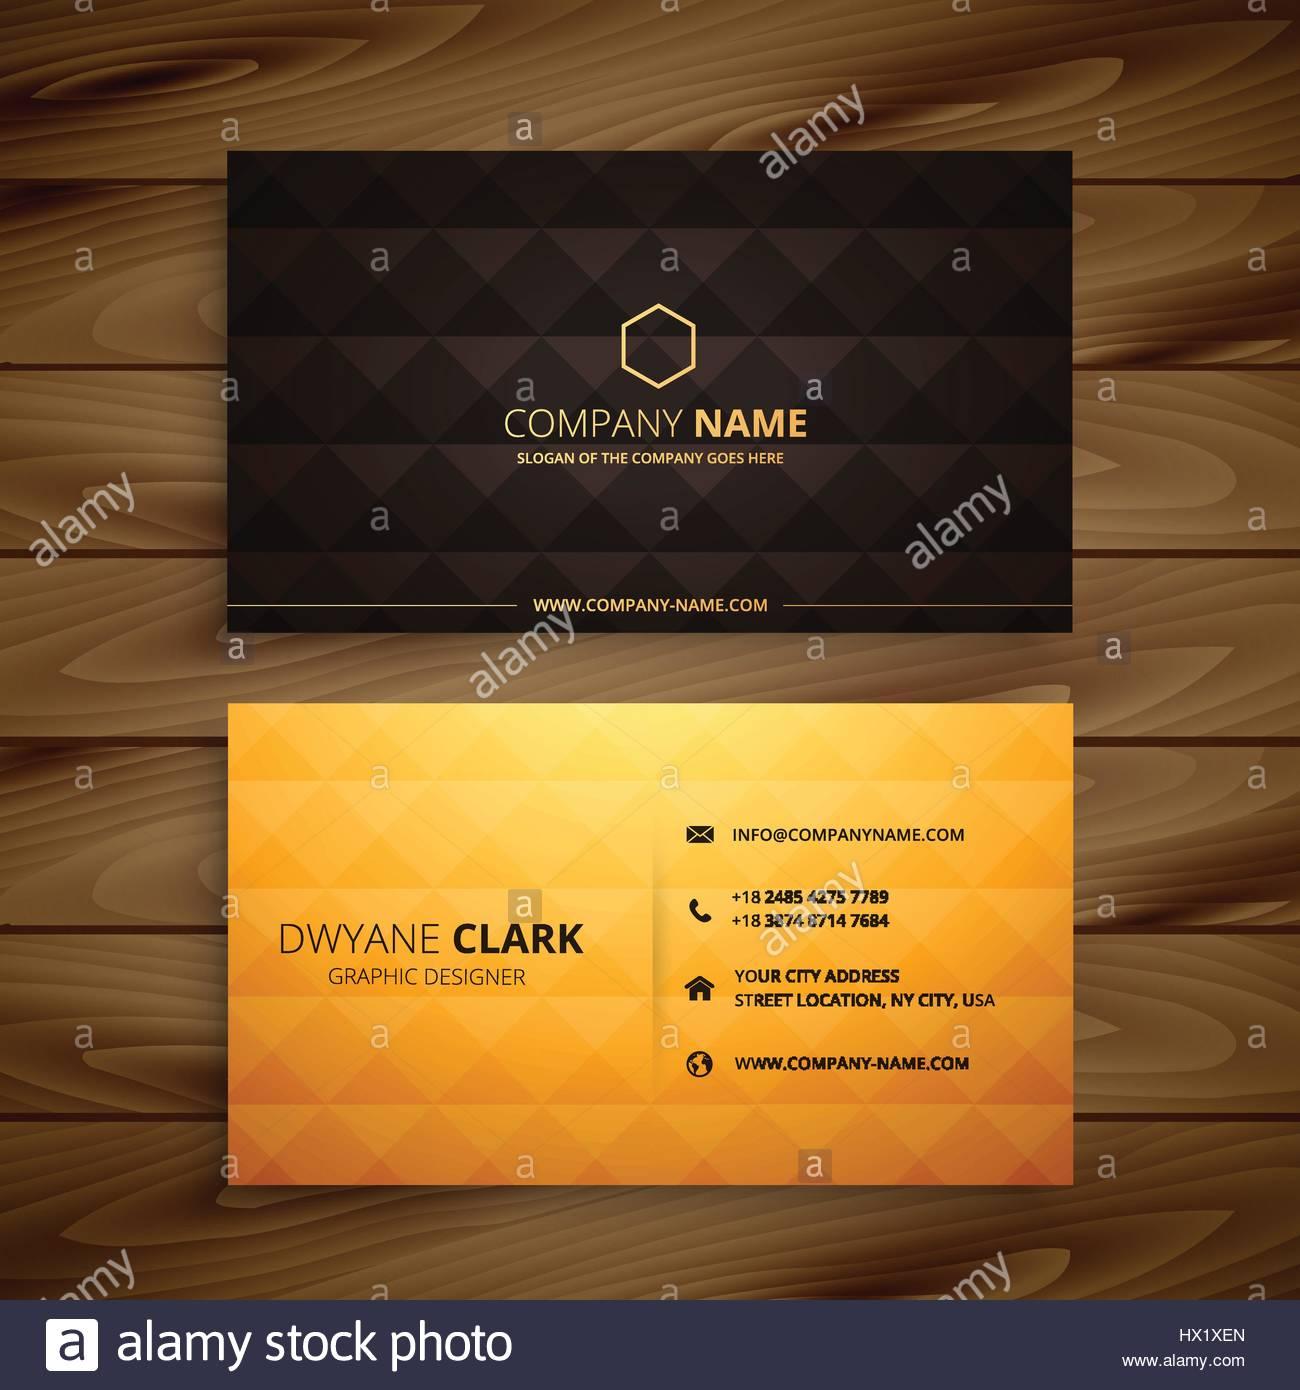 Premium diamond shape golden business card template vector design premium diamond shape golden business card template vector design illustration magicingreecefo Choice Image